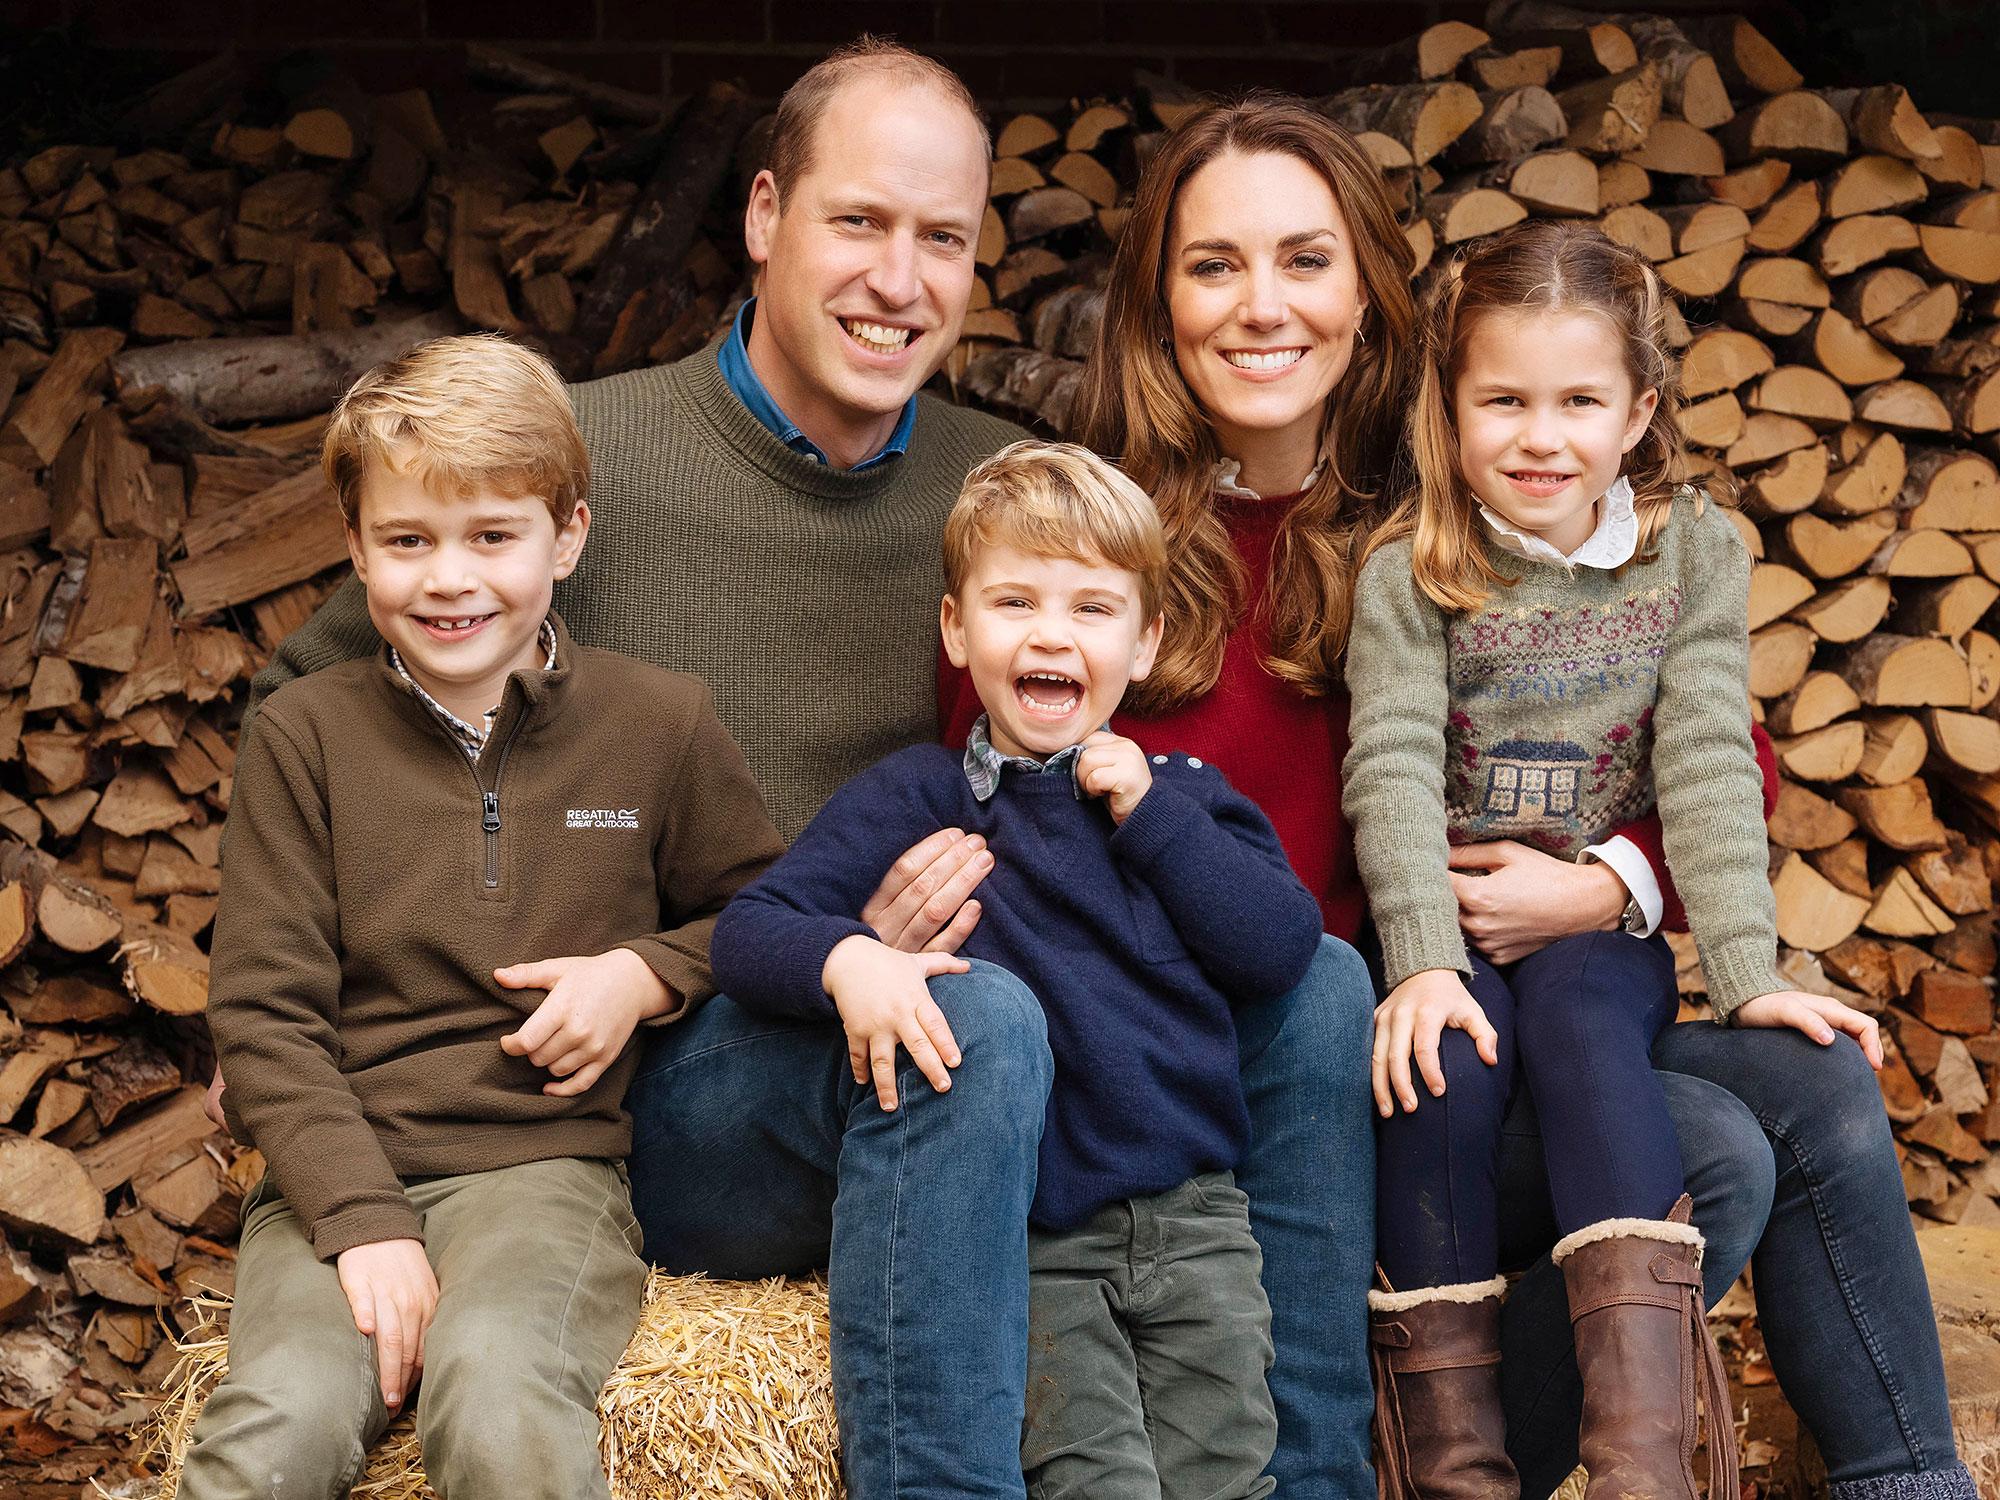 Prince George Prince William Prince Louis Duchess Kate Princess Charlotte Royal Christmas Card 2020